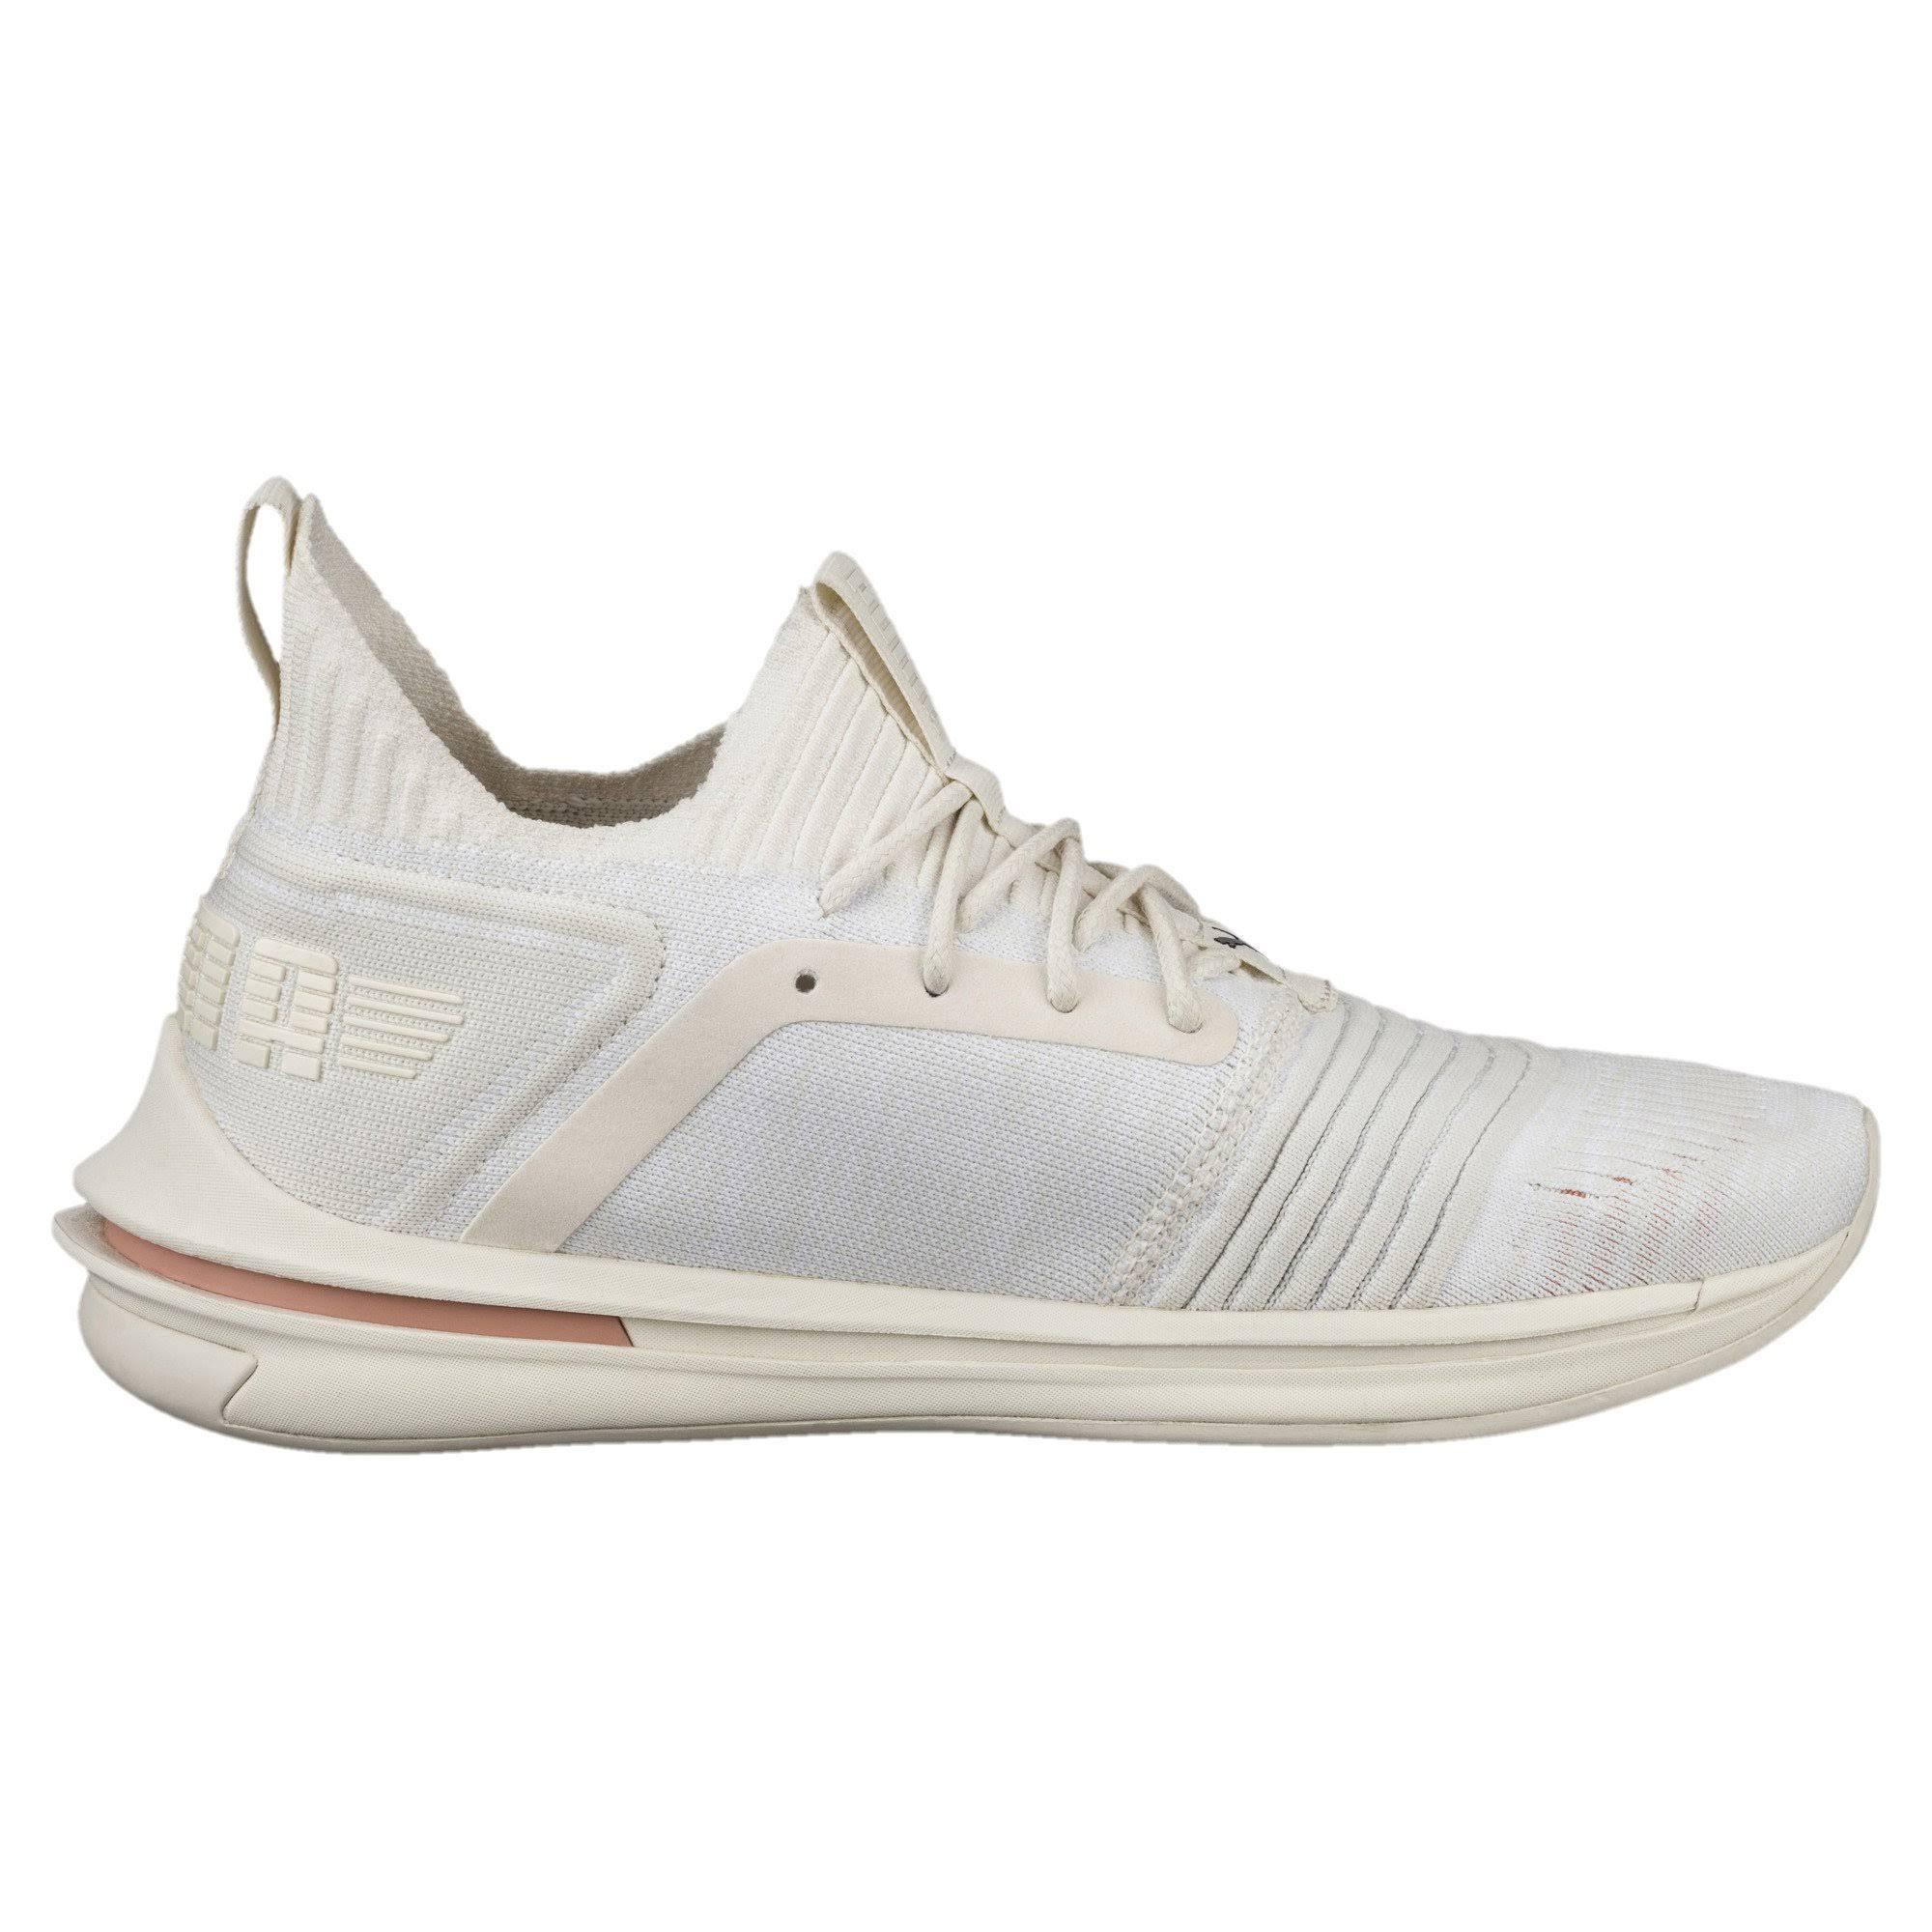 19048402 Zapatos Tamaño Puma Limitless 5 Blanco 8 Para Hombre Sr Evoknit Susurro Ignite 8Hw0Z4qwO